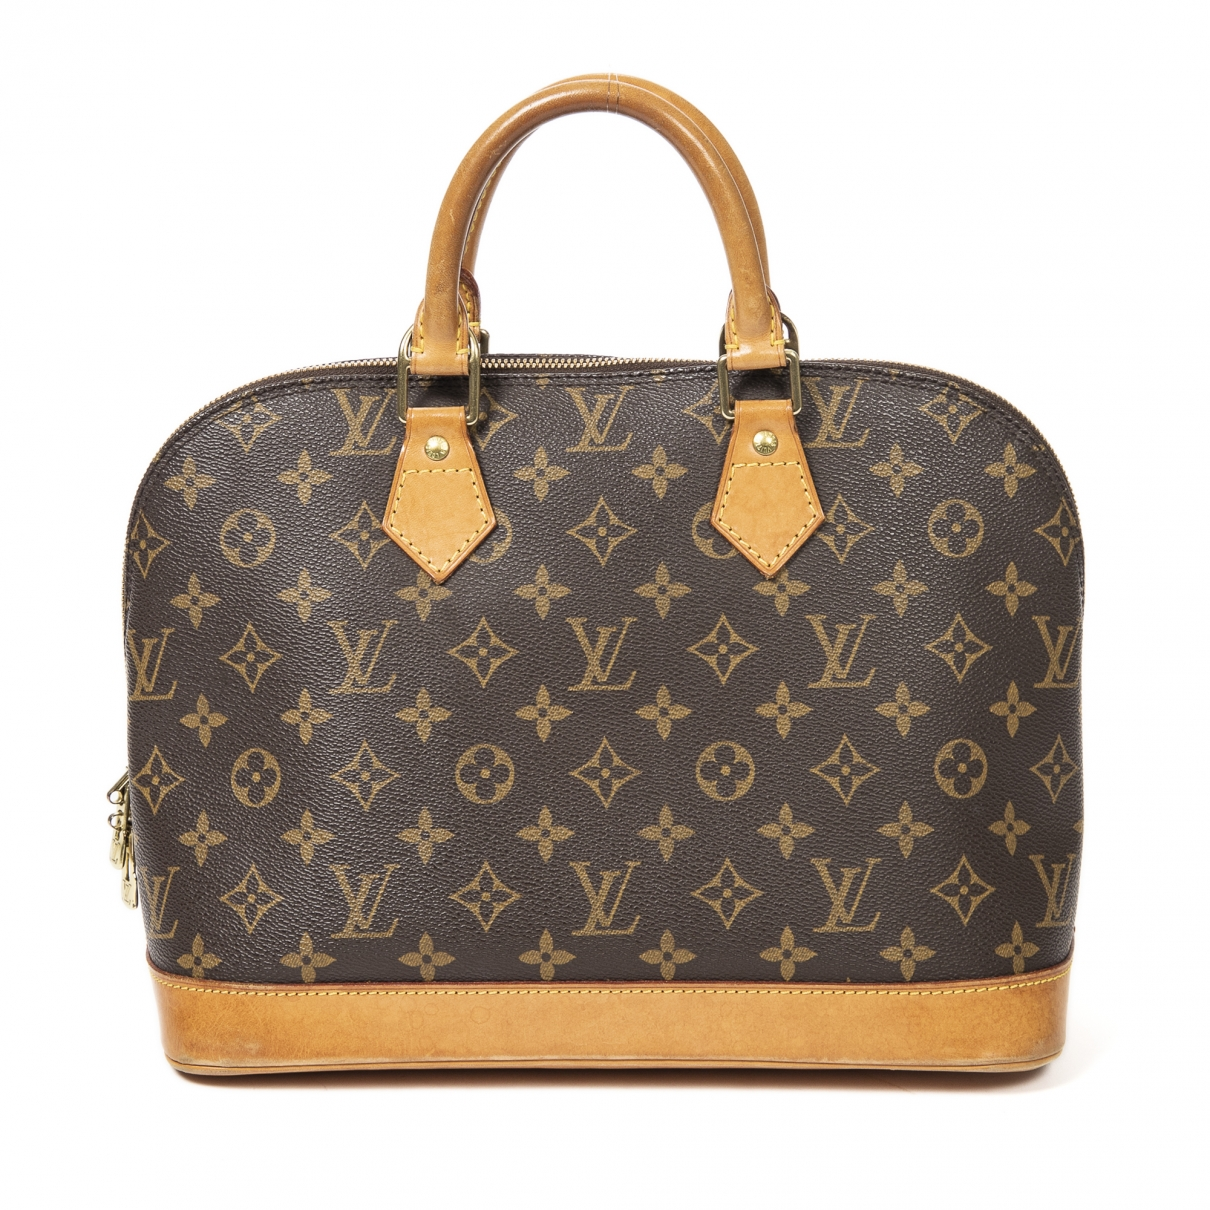 Louis Vuitton - Sac a main Alma pour femme en cuir - marron